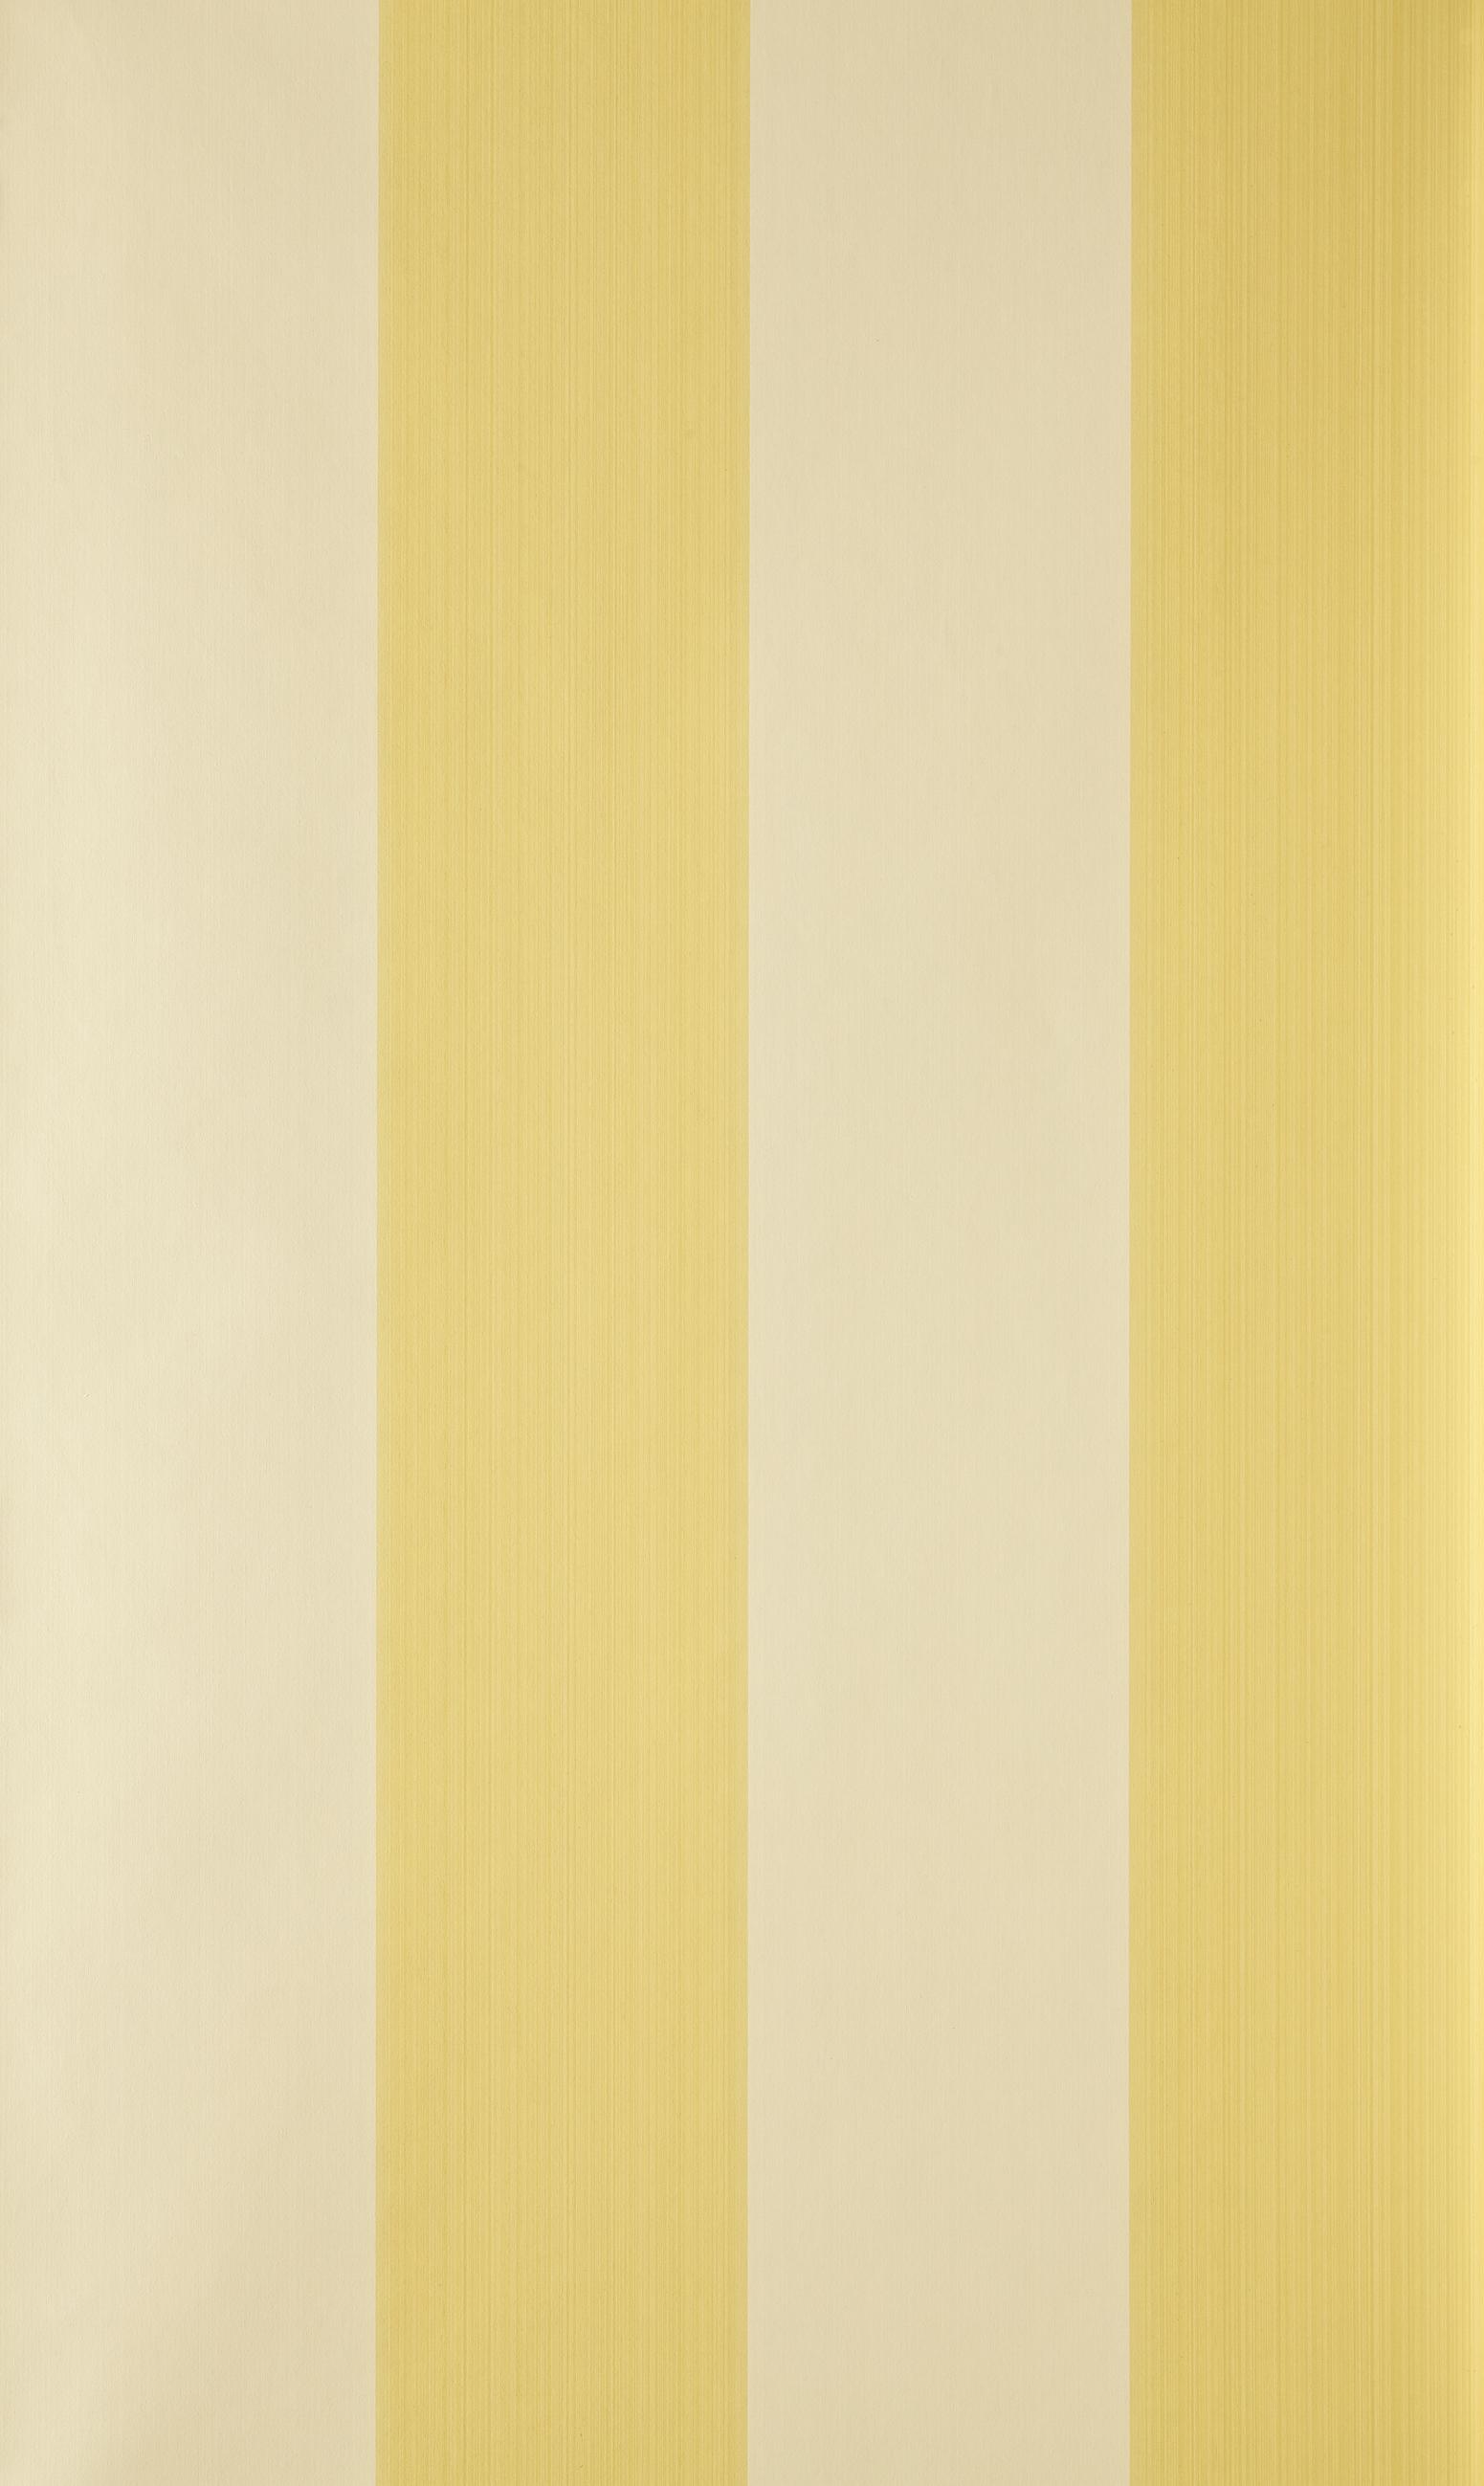 Broad Stripe 1322 $195 Per Roll  Order Now